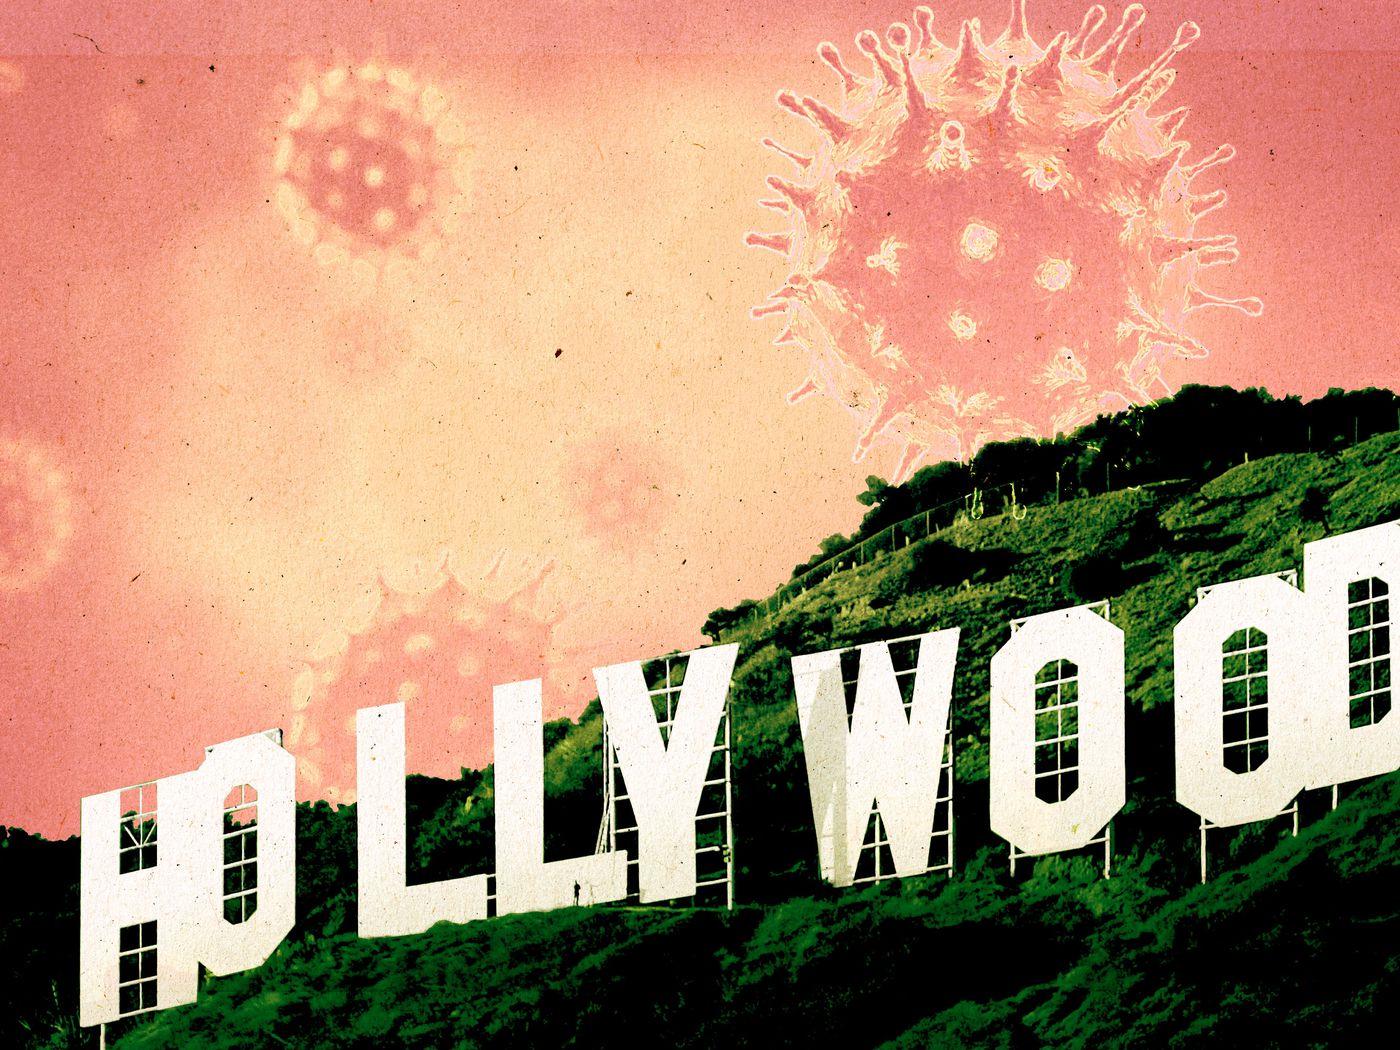 Hollywood κορωνοϊός: Σταμάτησαν τα γυρίσματα λόγω έξαρσης κρουσμάτων